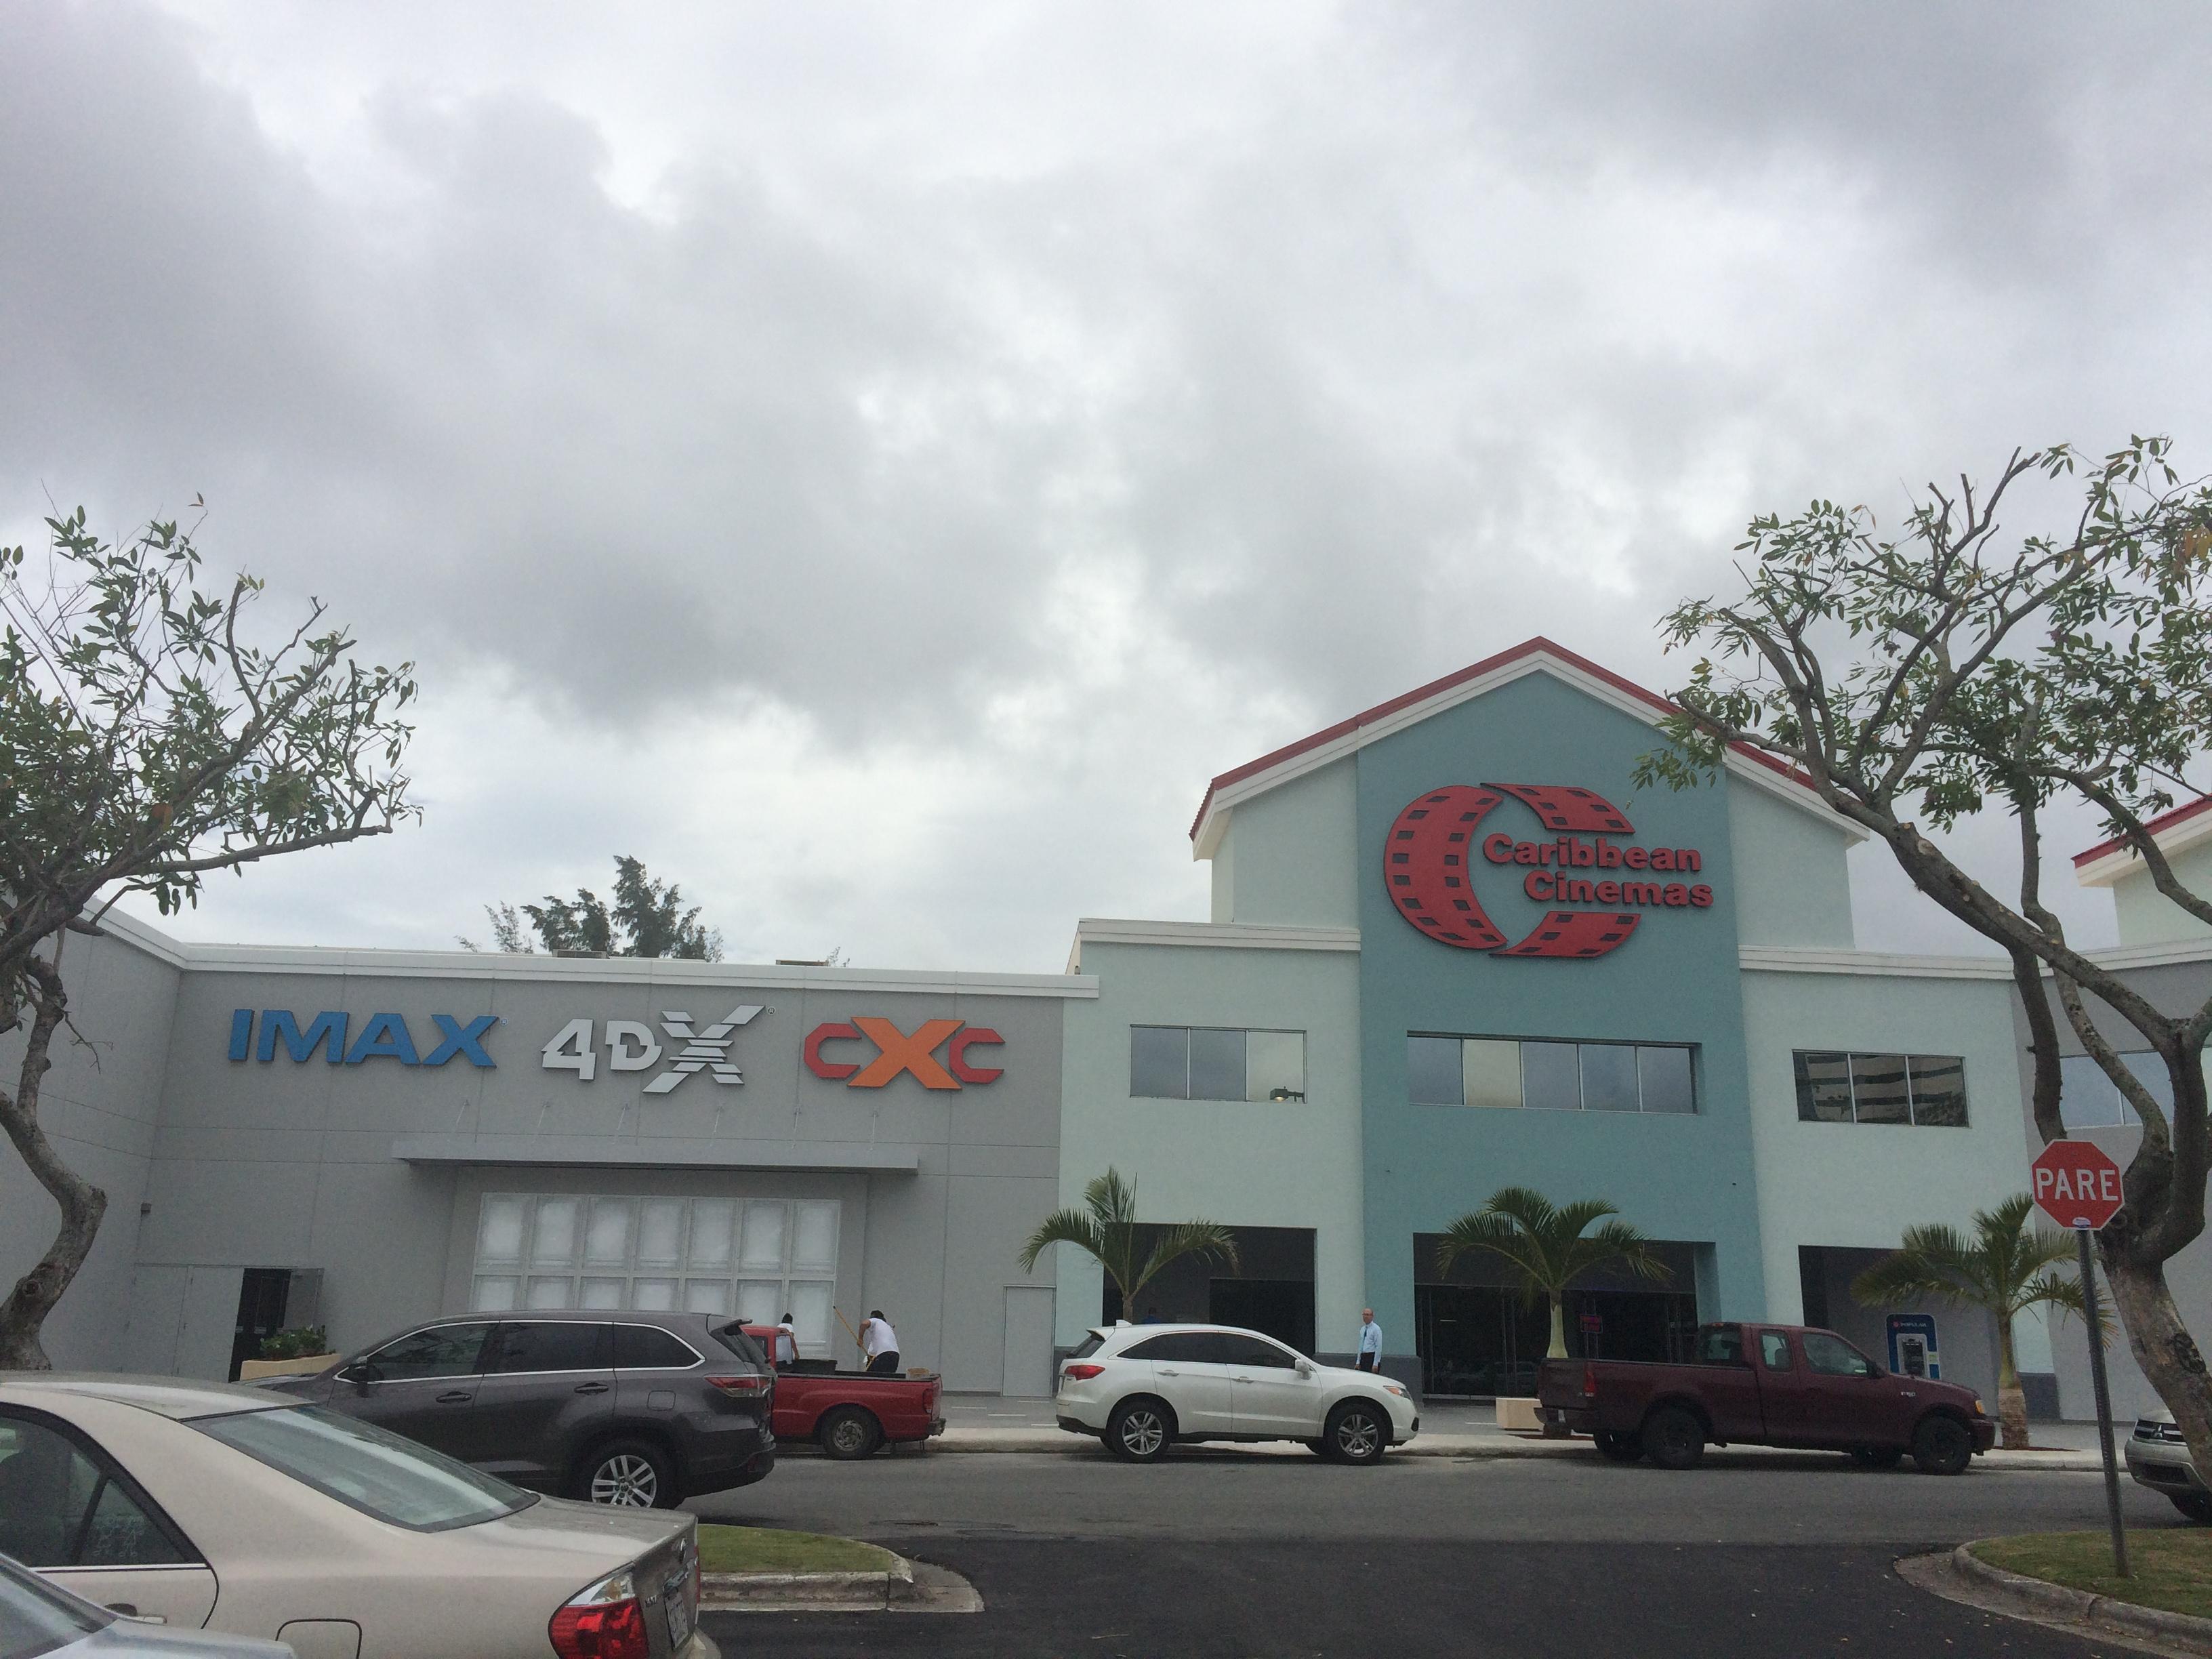 caribbean-cinemas-fachada